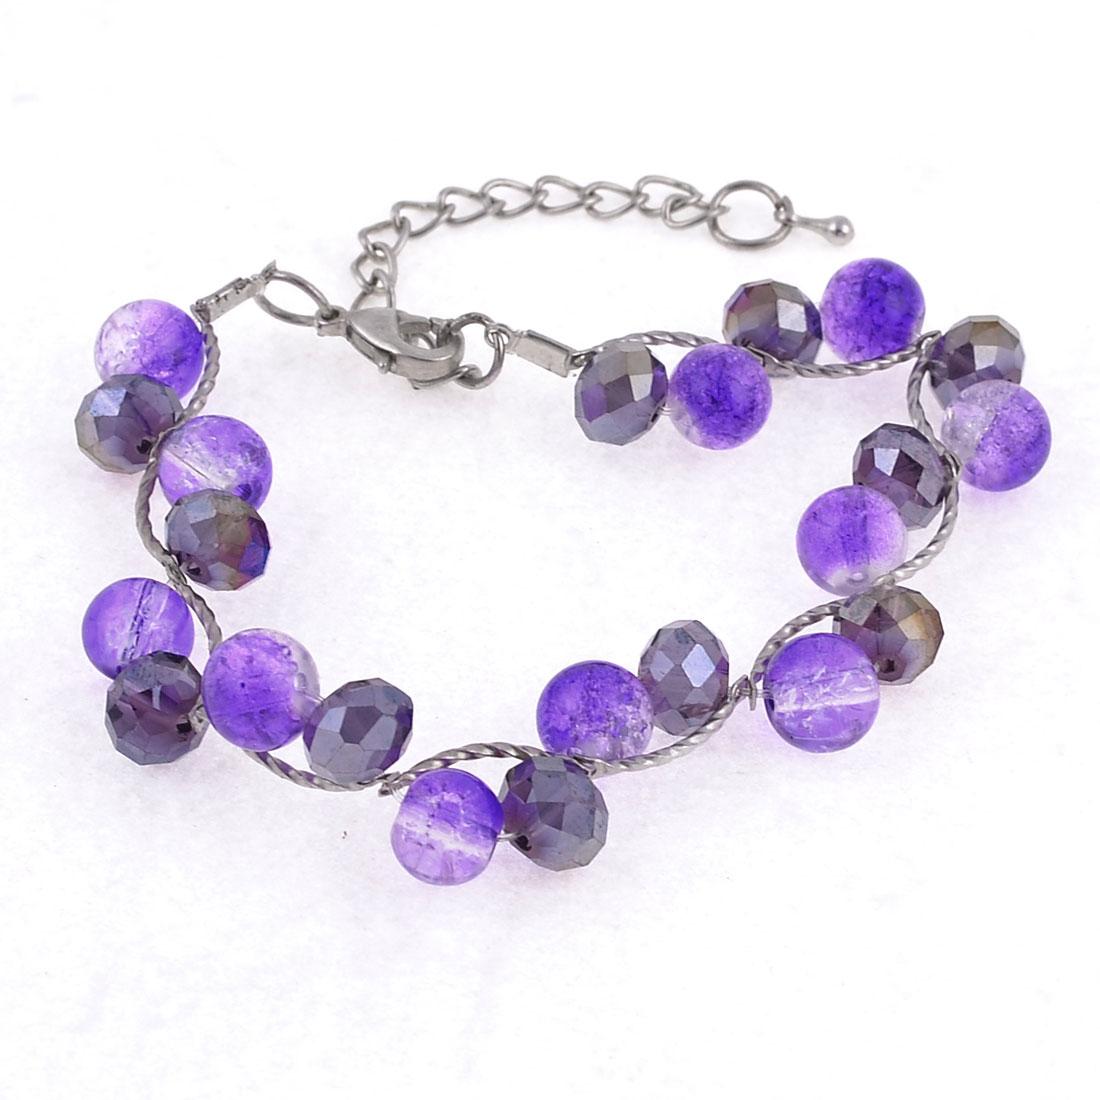 Woman Purple Round Beads Silver Tone Metal Chain Bracelet Jewelry